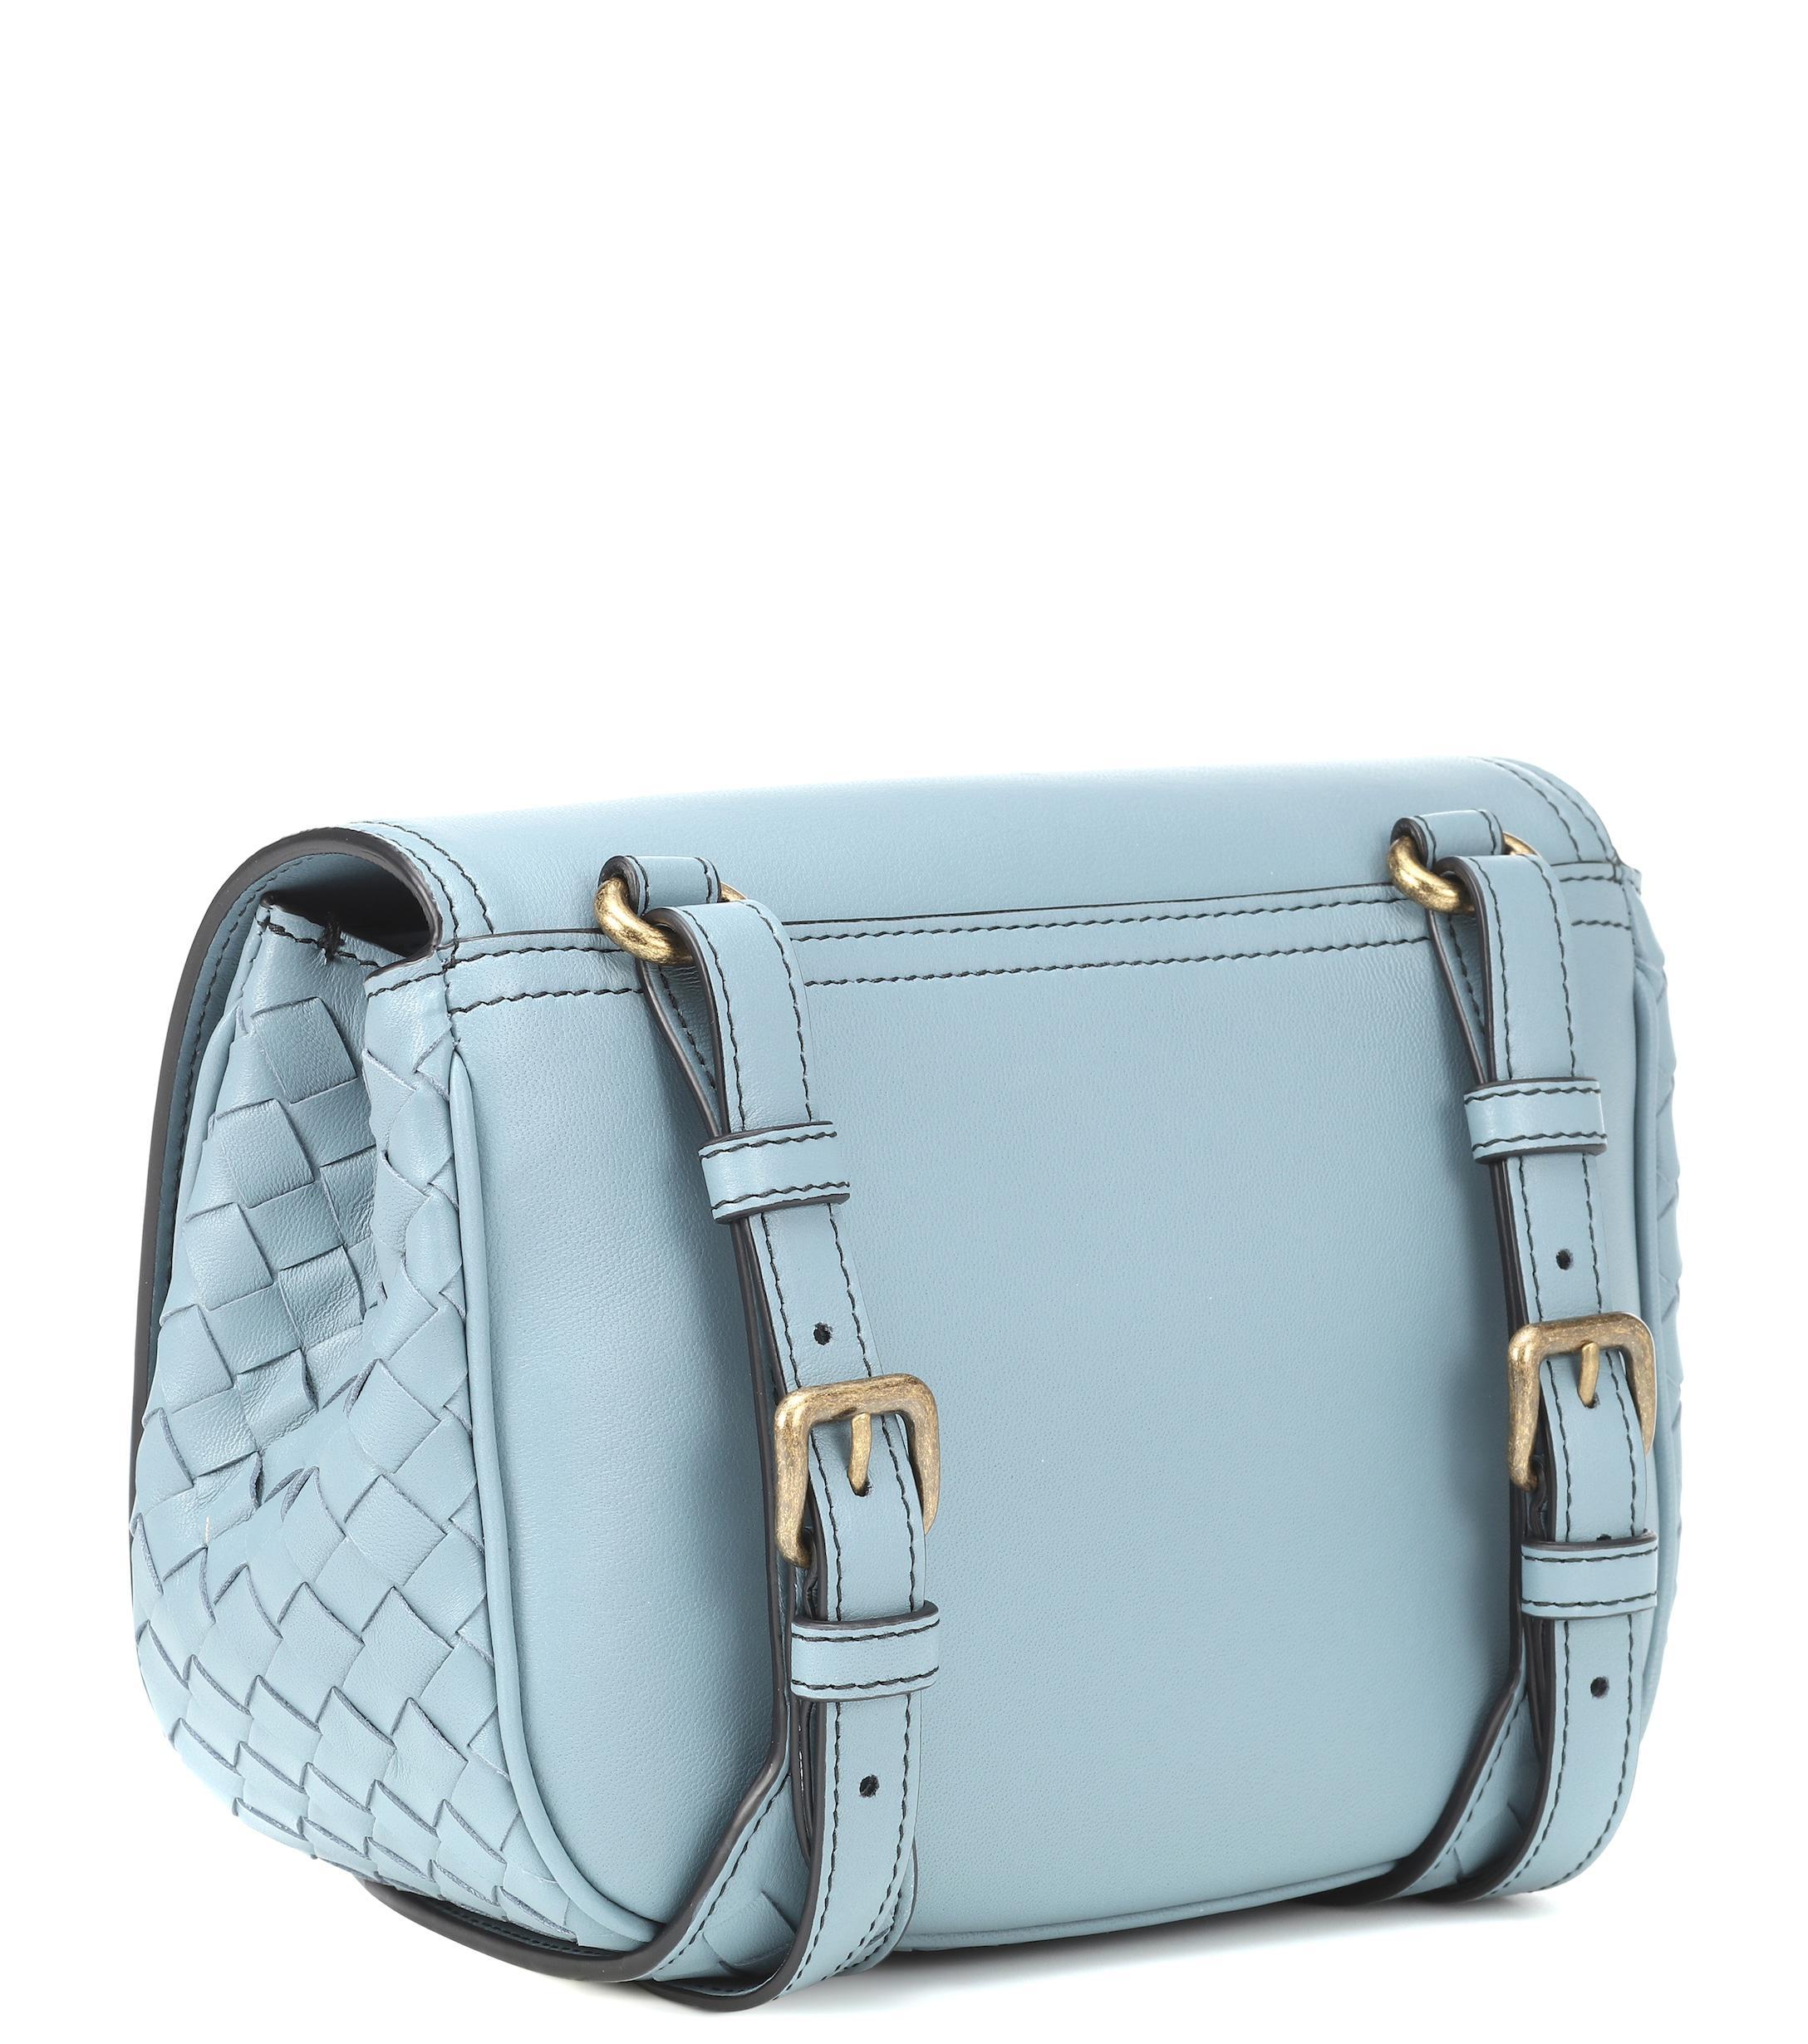 ce8e1272e84 Bottega Veneta - Blue Bv Luna Leather Crossbody Bag - Lyst. View fullscreen